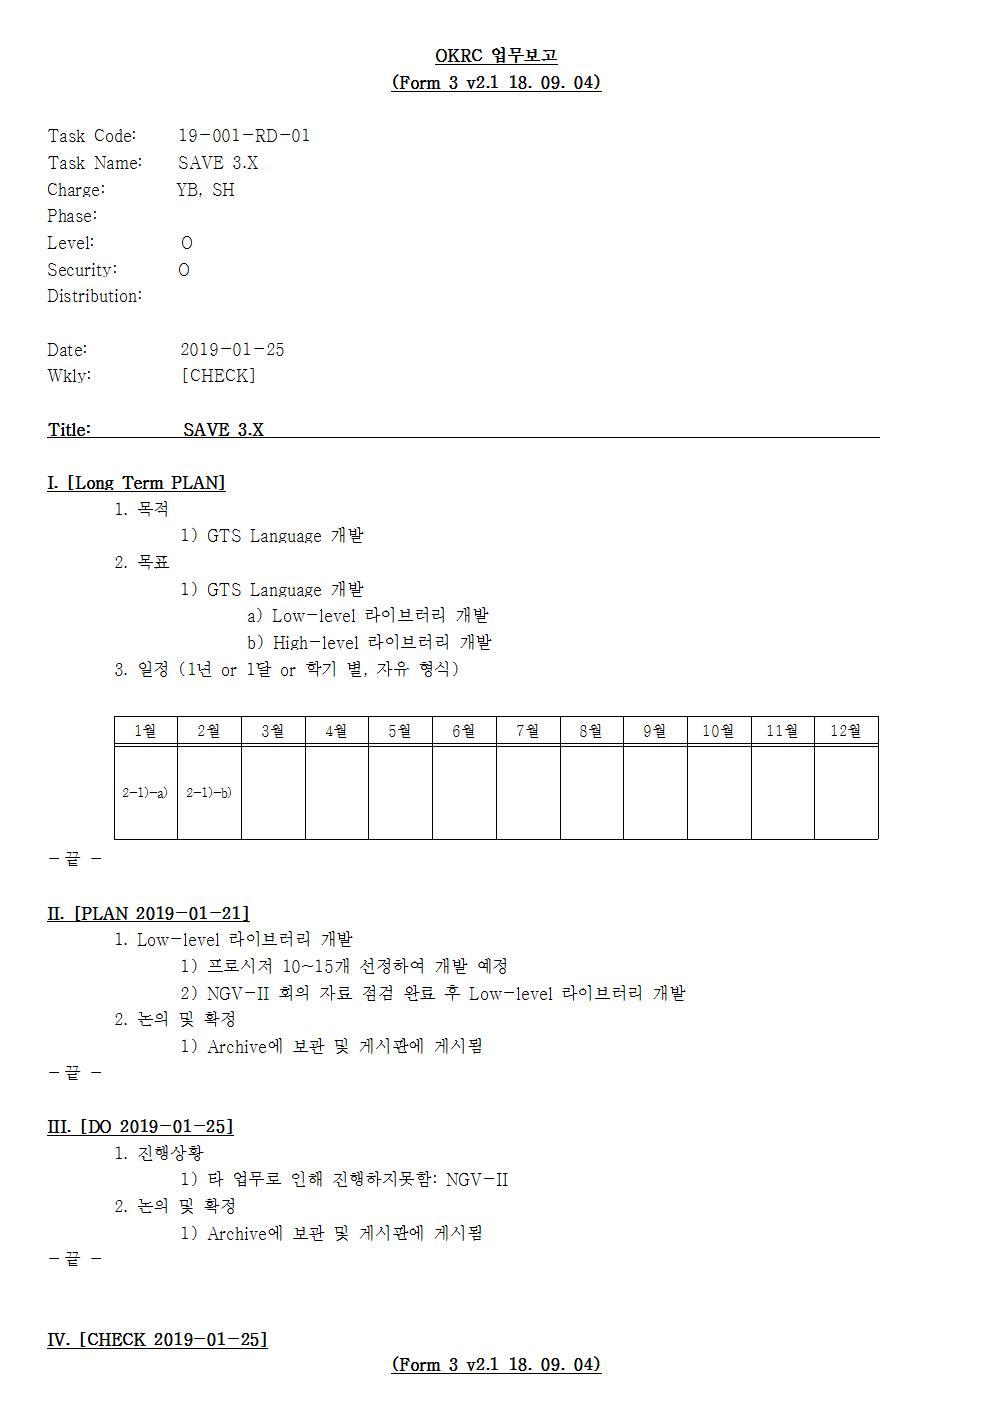 D-[19-001-RD-01]-[SAVE 3.X]-[2019-01-25][SH]001.jpg